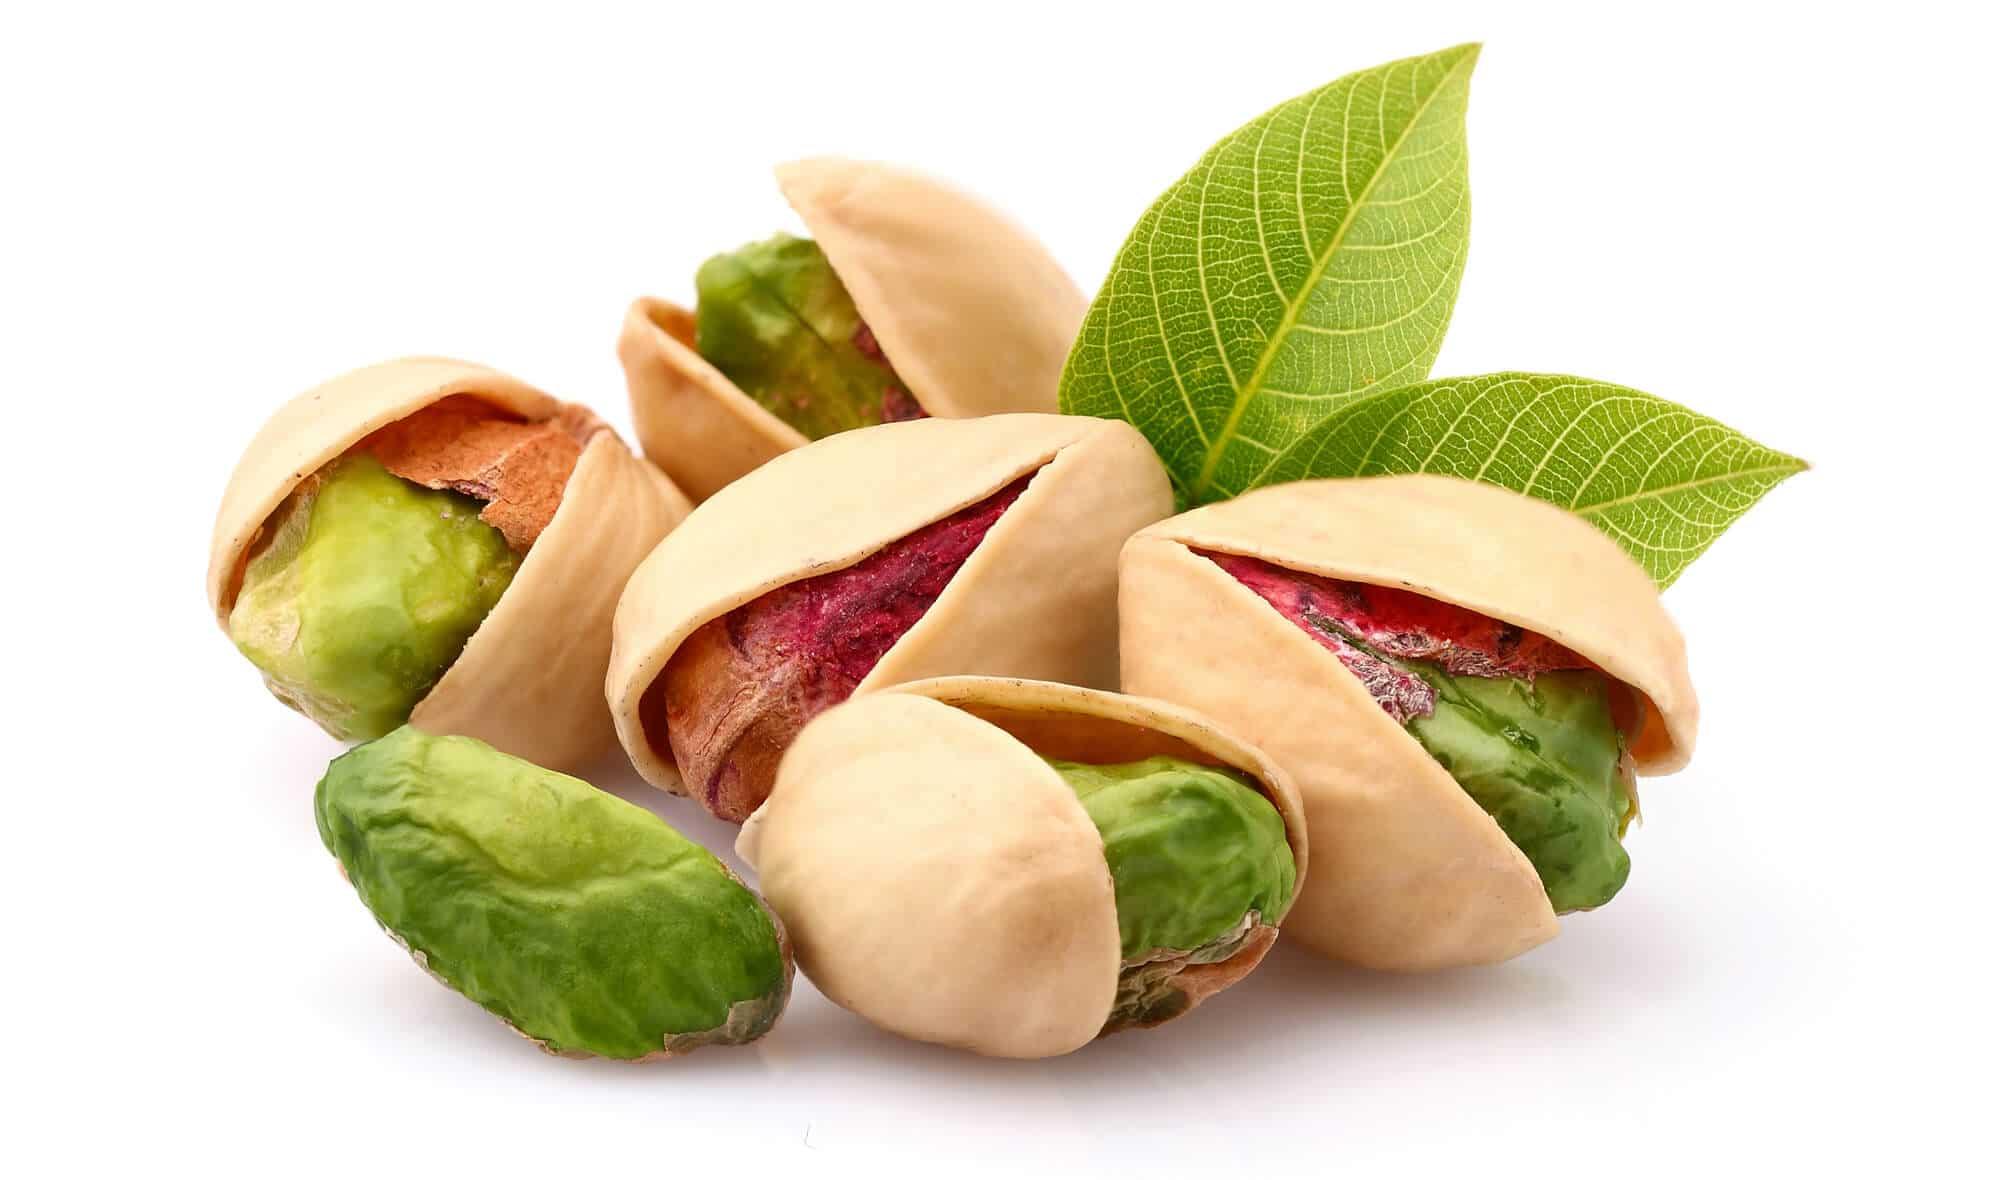 pistachio-lemon-cheeseballs-9-cropped